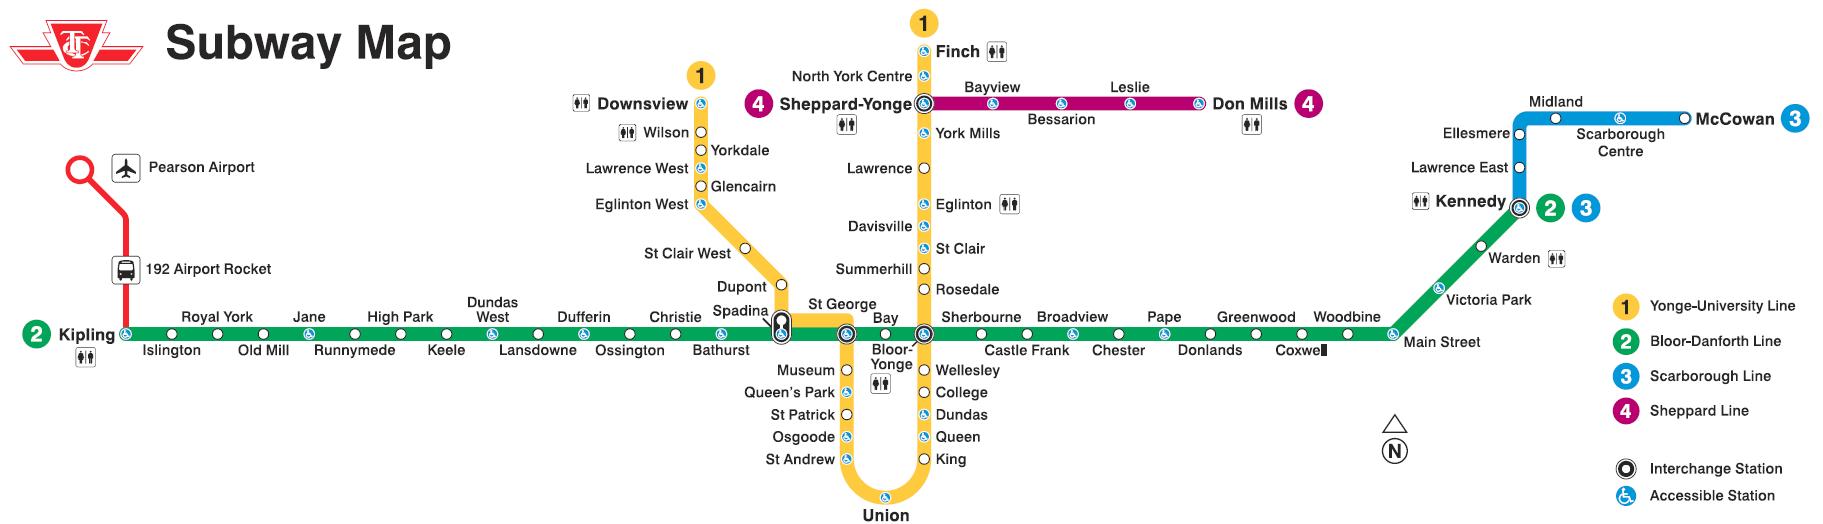 Ttc Subway Map 2015